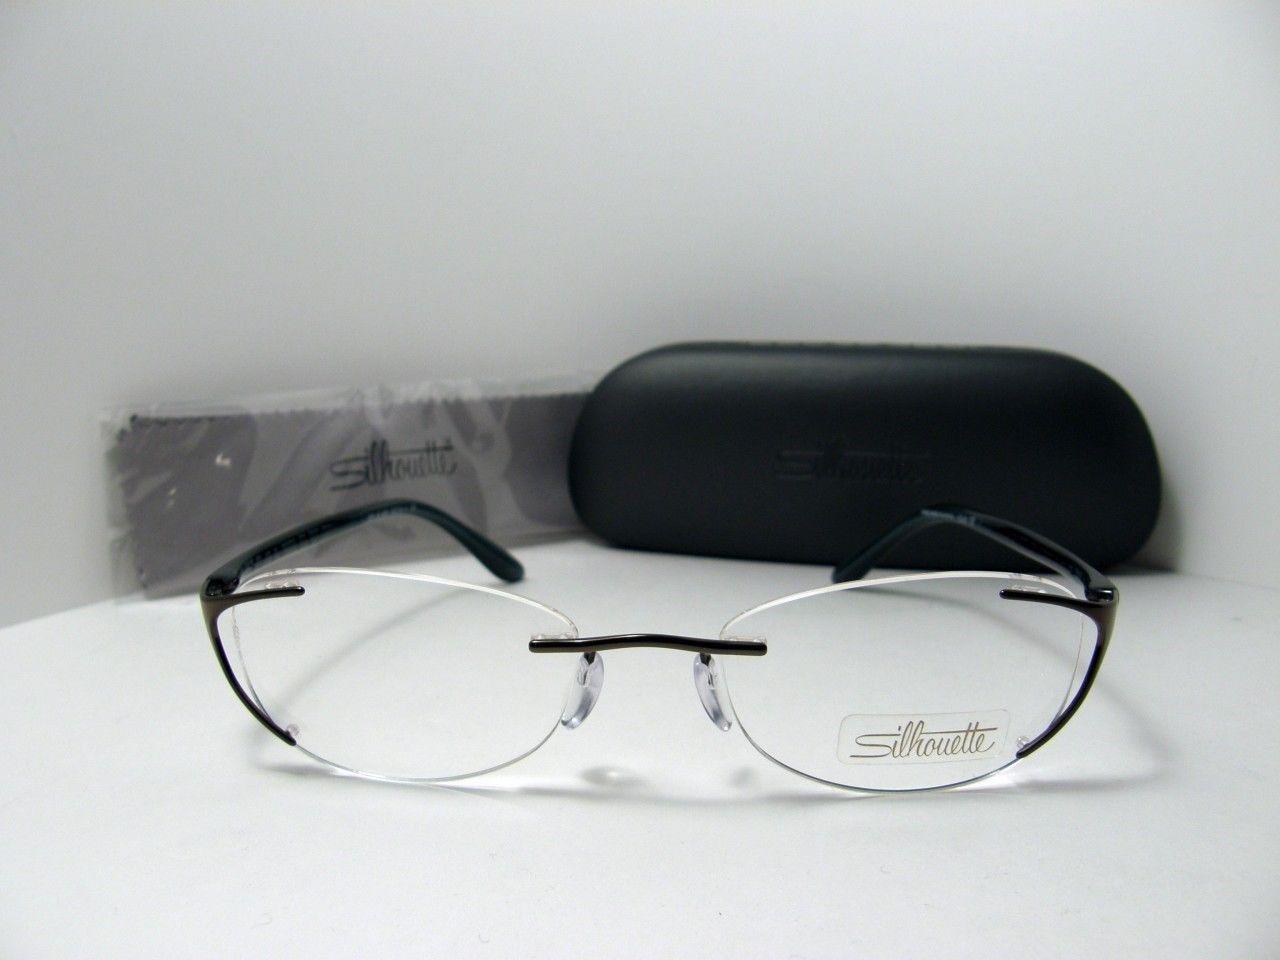 Custom Made Eyeglass Frames New York : New Authentic Silhouette Titanium Rimless Eyeglasses 6659 ...